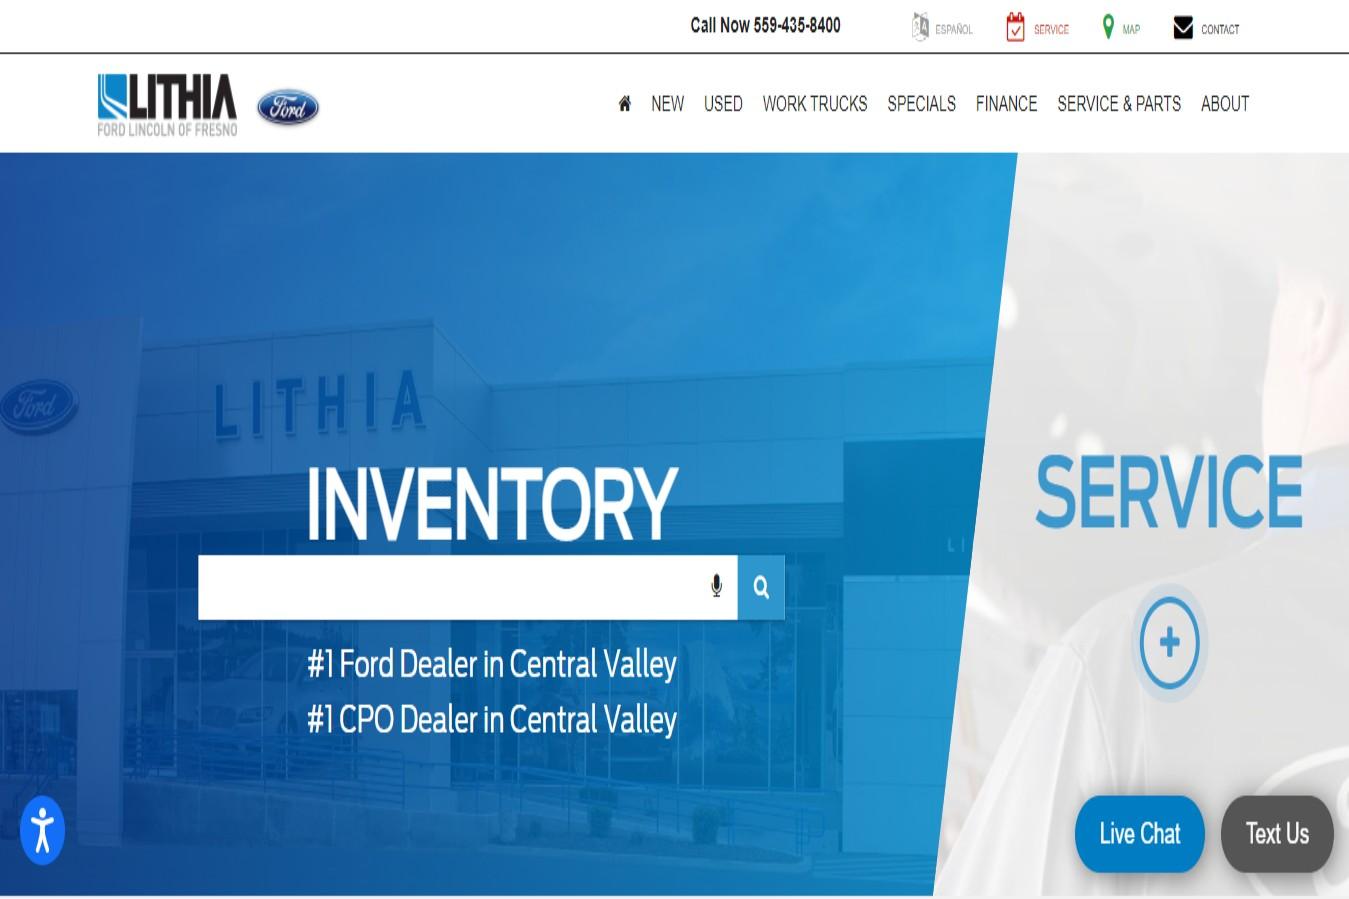 Lithia Top-rated Car Dealership in Fresno, CA